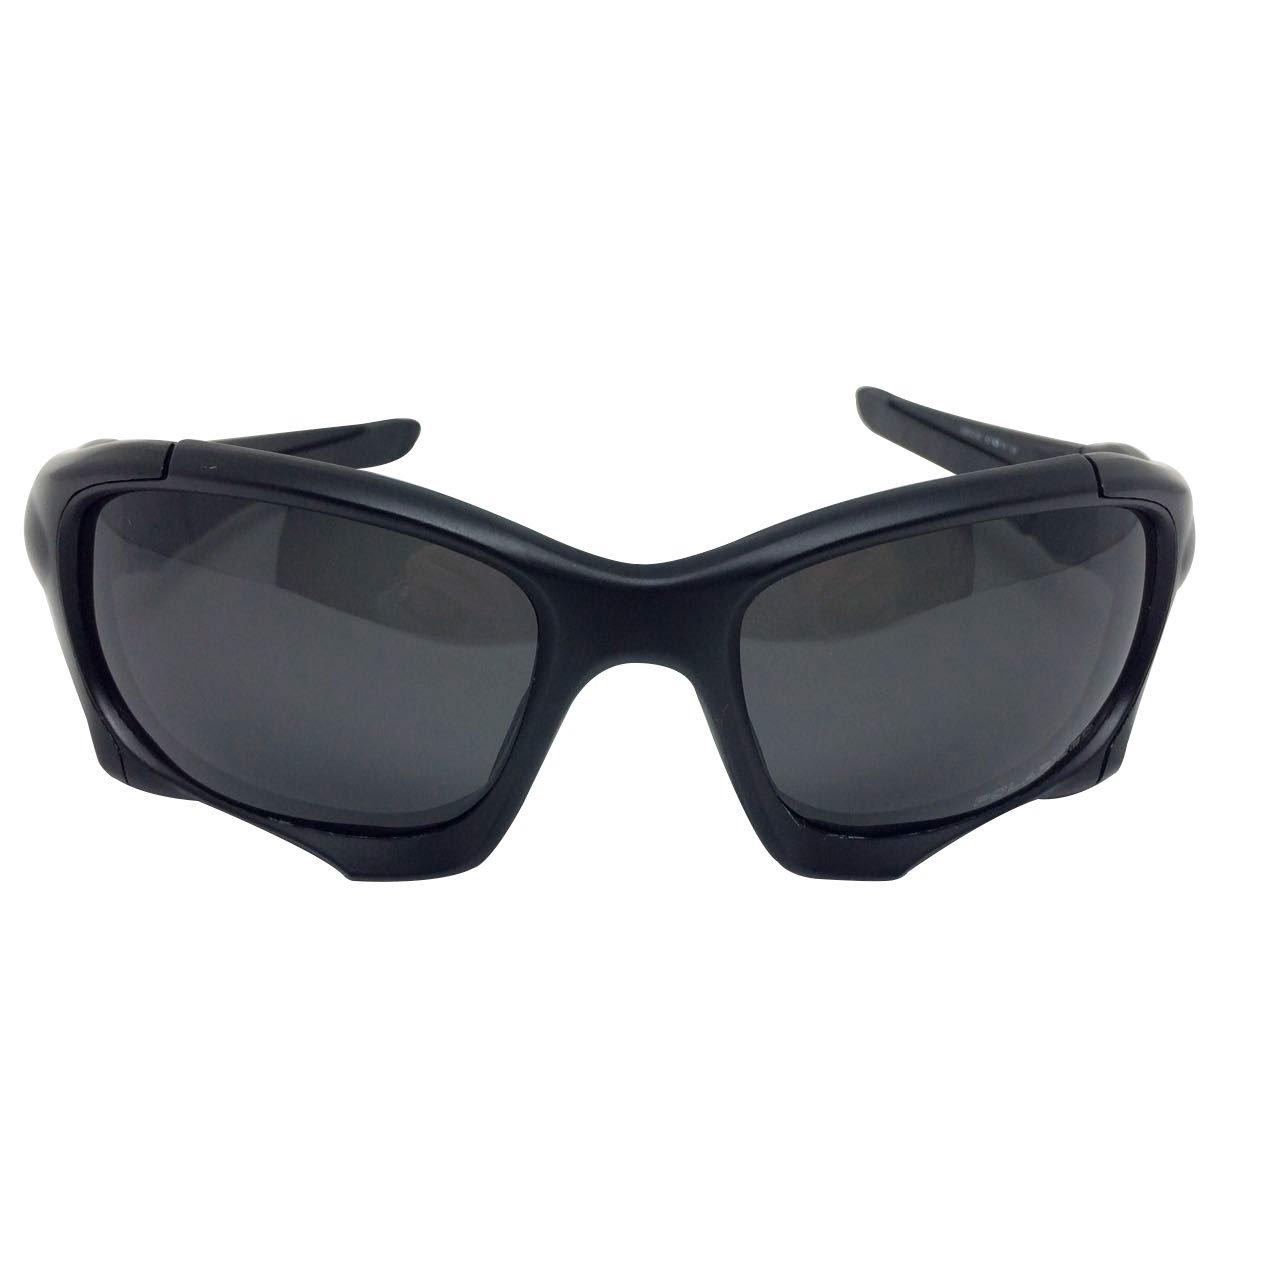 4481f05d298da Óculos Oakley Pit Boss 2 lente preta – Sanfer Acessórios